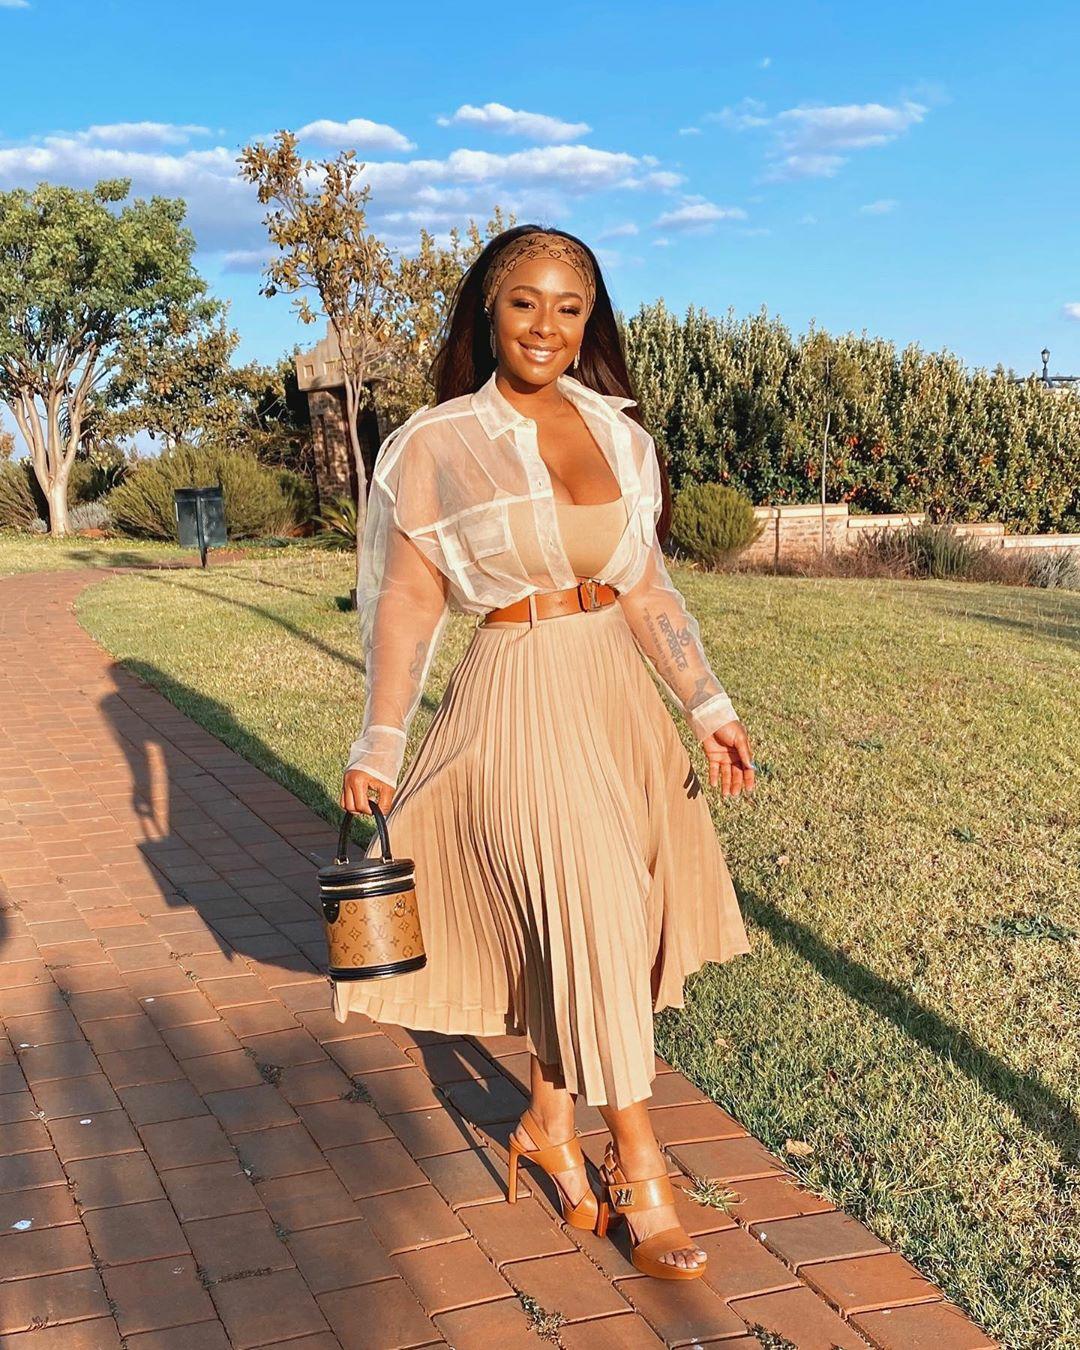 Fashion Influencers On Instagram Show Off Stylish Looks Last Week